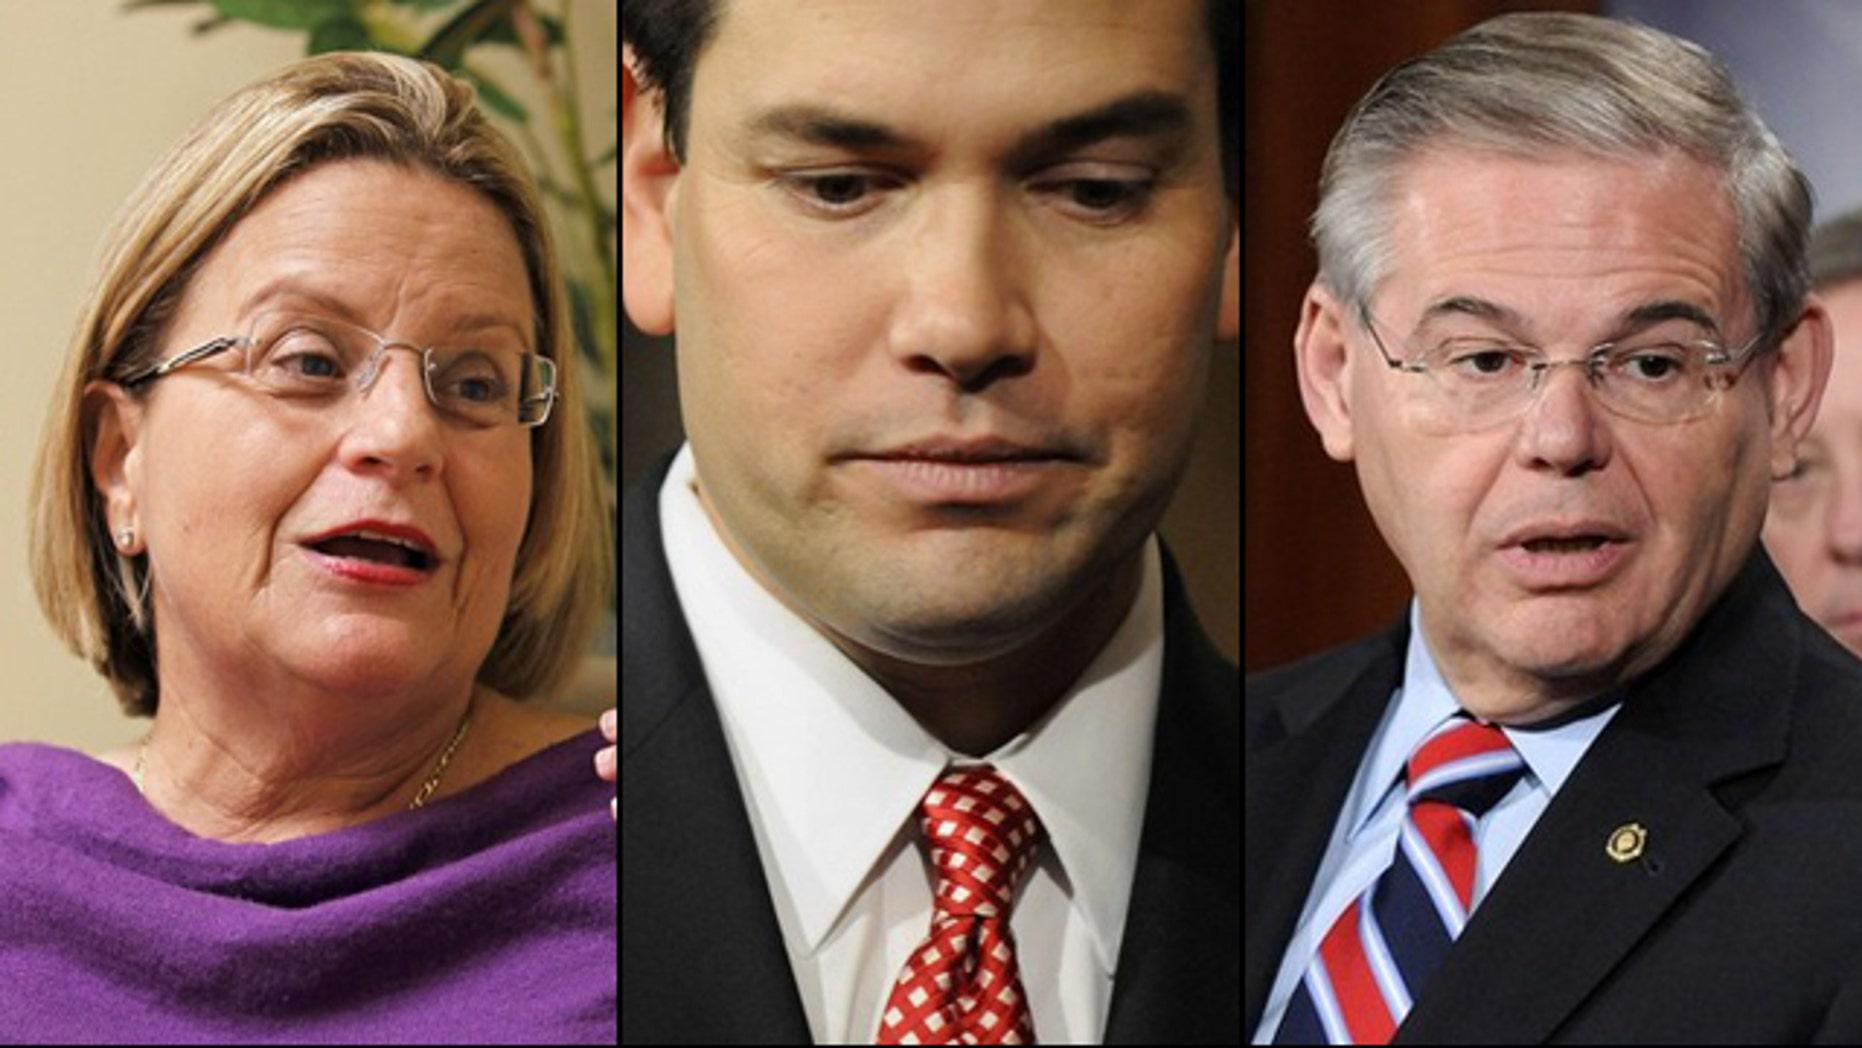 Rep. Ileana Ros-Lehtinen, R-Fla., Sens. Marco Rubio, R-Fla., and Robert Menendez, D-N.J., aren't happy with President Obama's easing of Cuba travel restrictions. (Reuters)